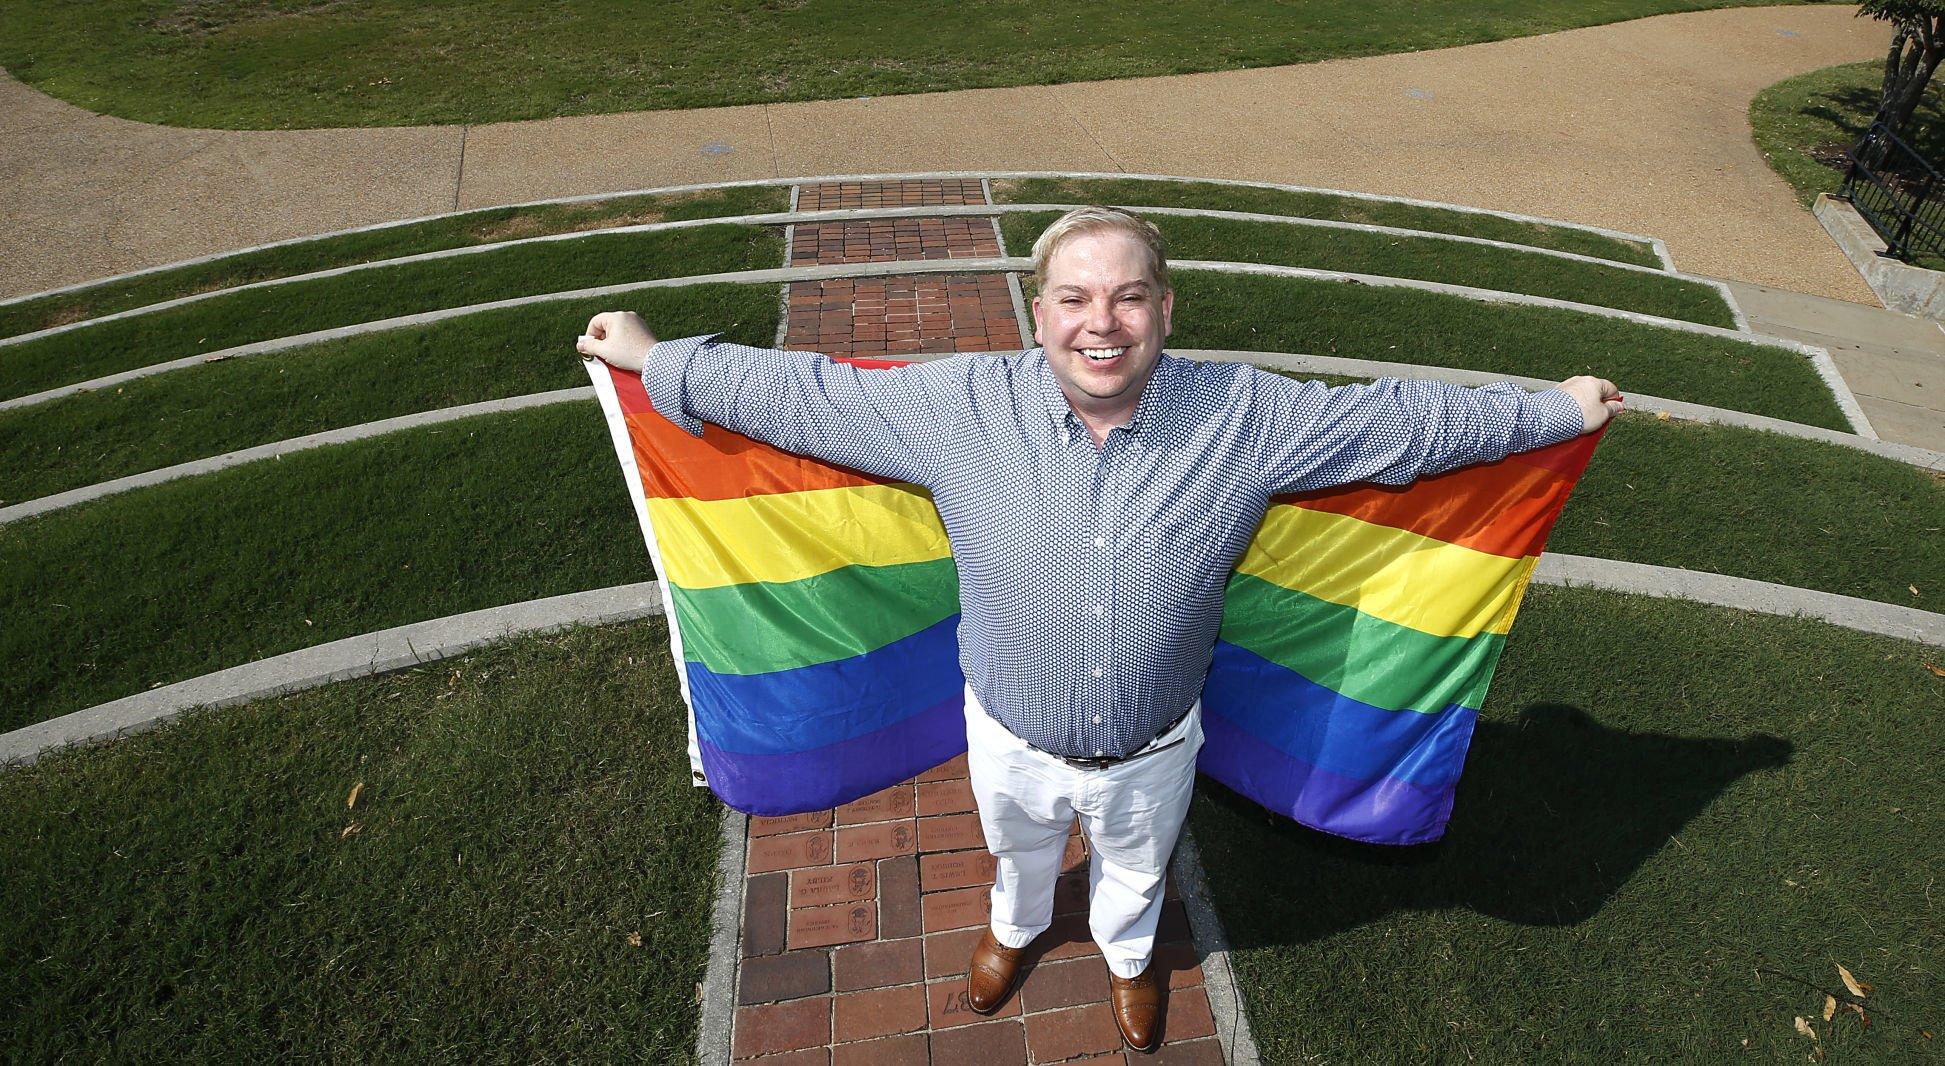 Gay men in richmond meet